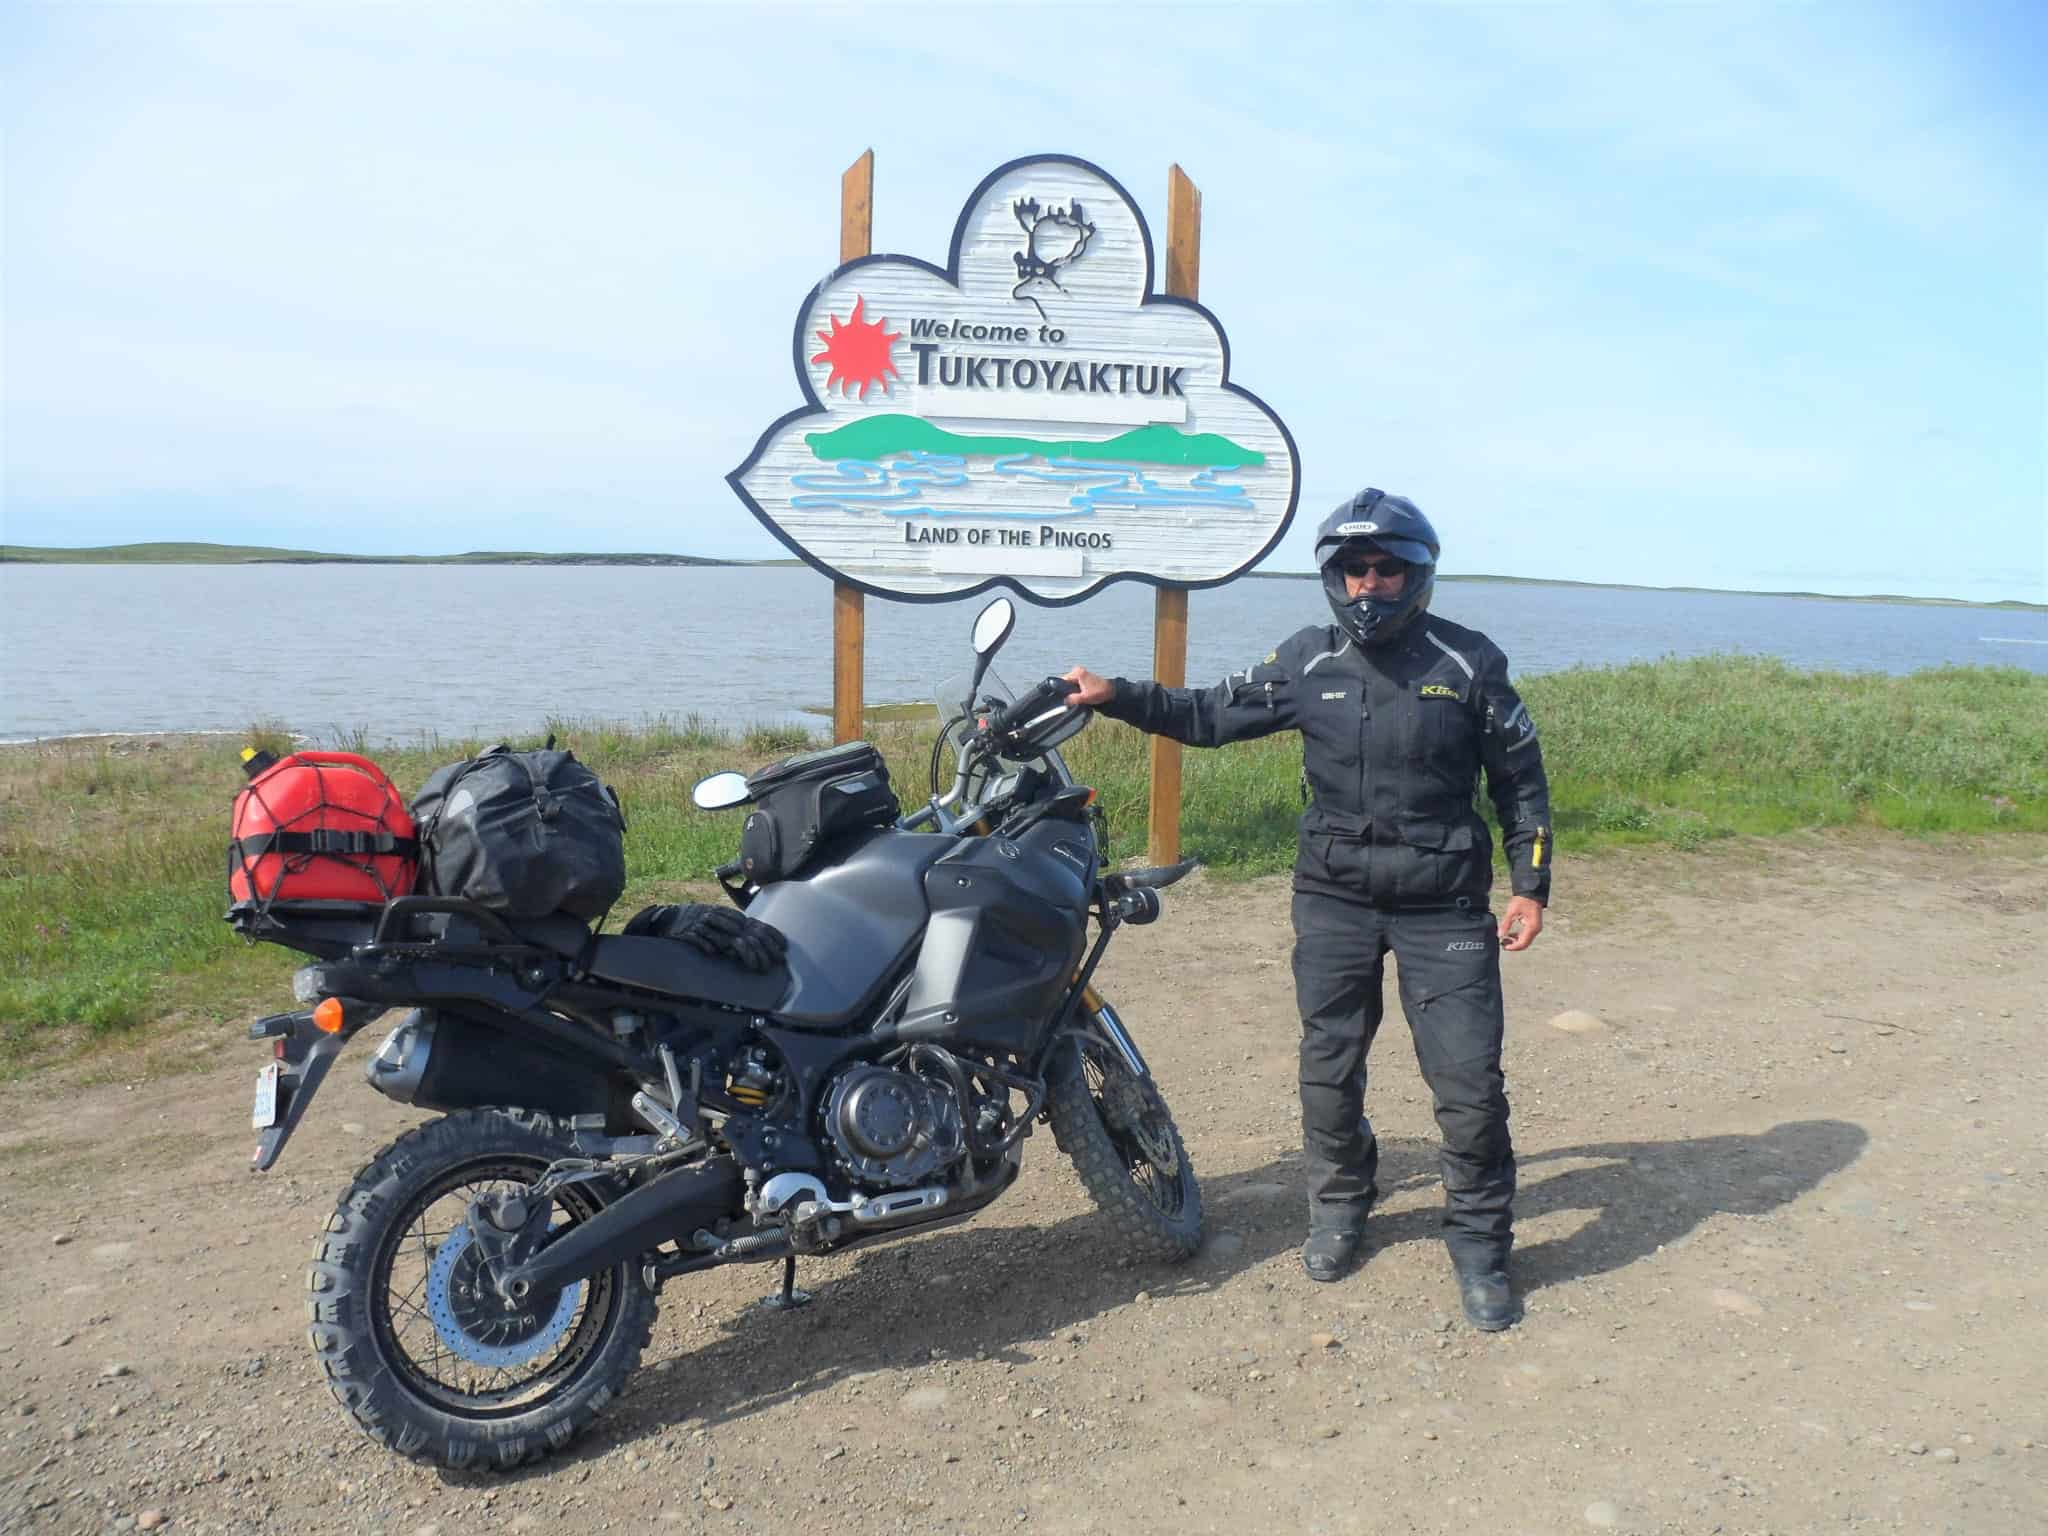 Tuktoyaktuk or Bust: taking the road rarely travelled